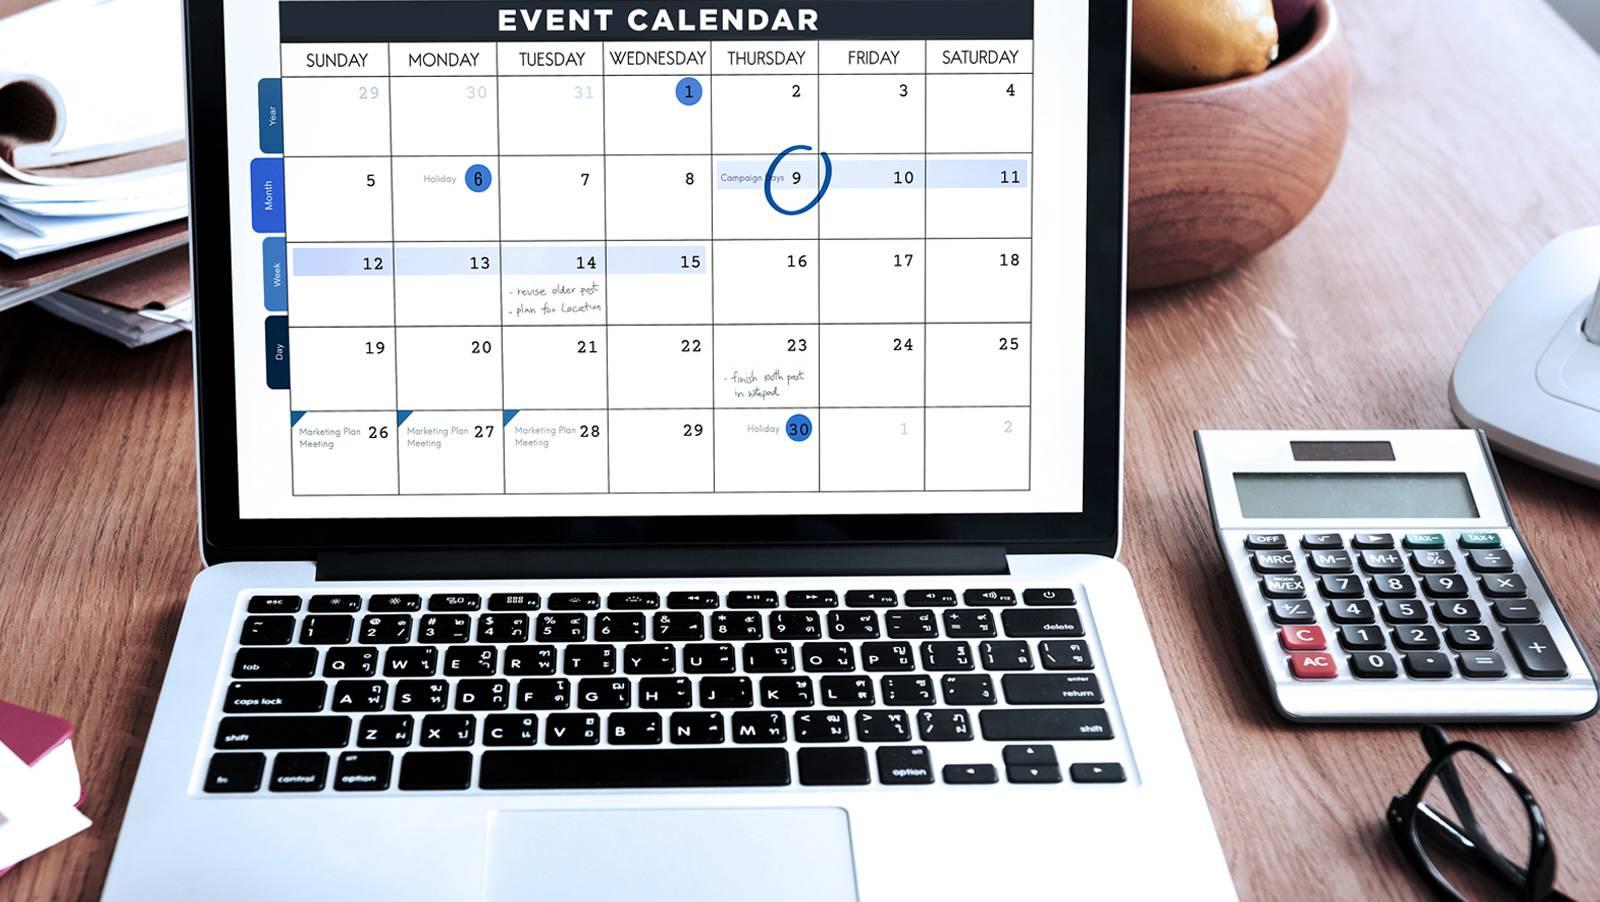 CalvinAyre.com December 2019 Featured Conferences & Events